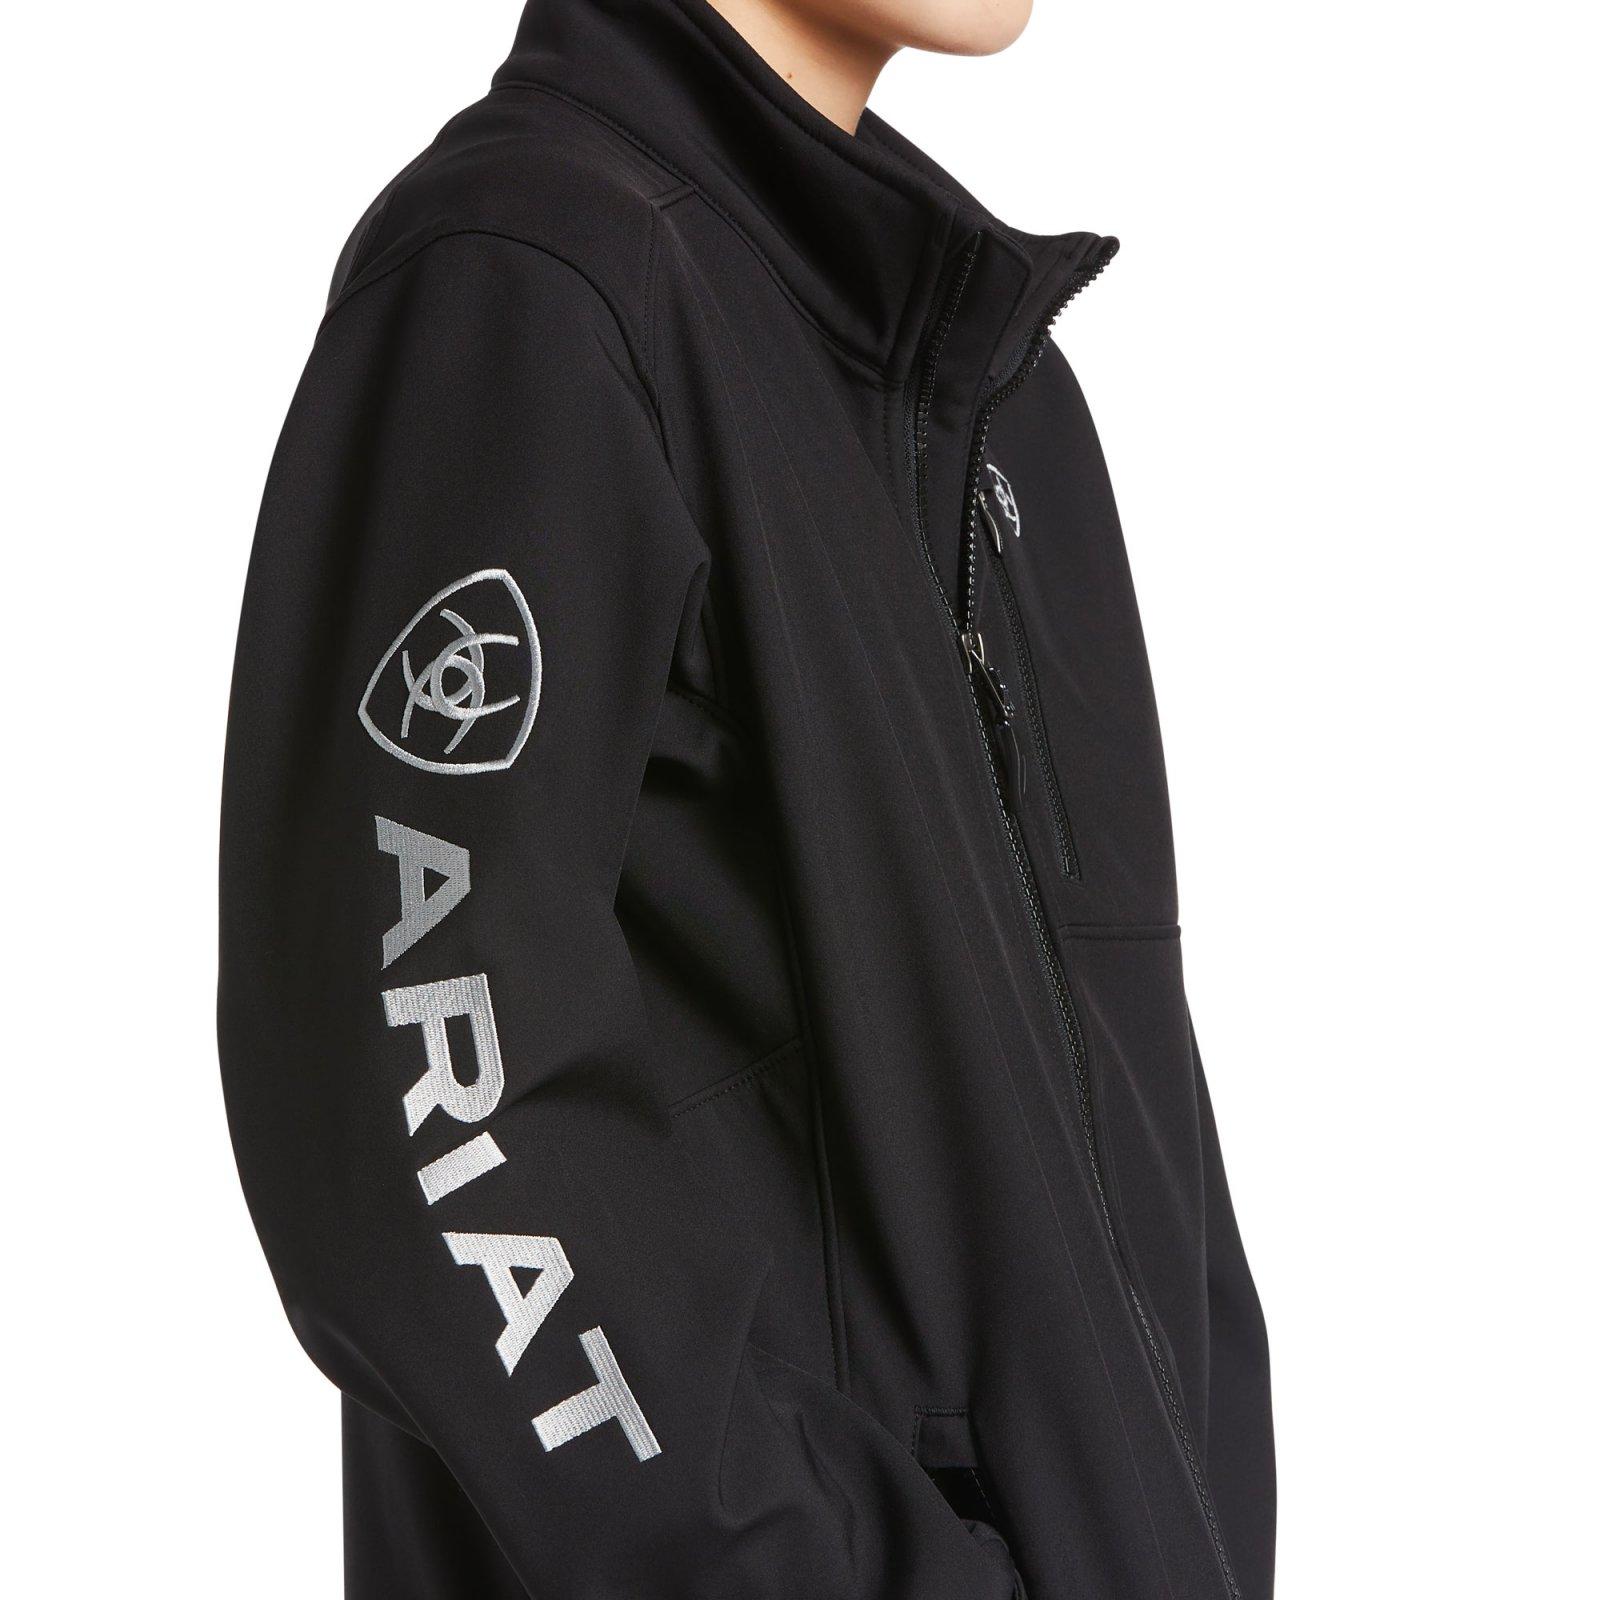 Boys Logo 2.0 Softshell Jacket from Ariat